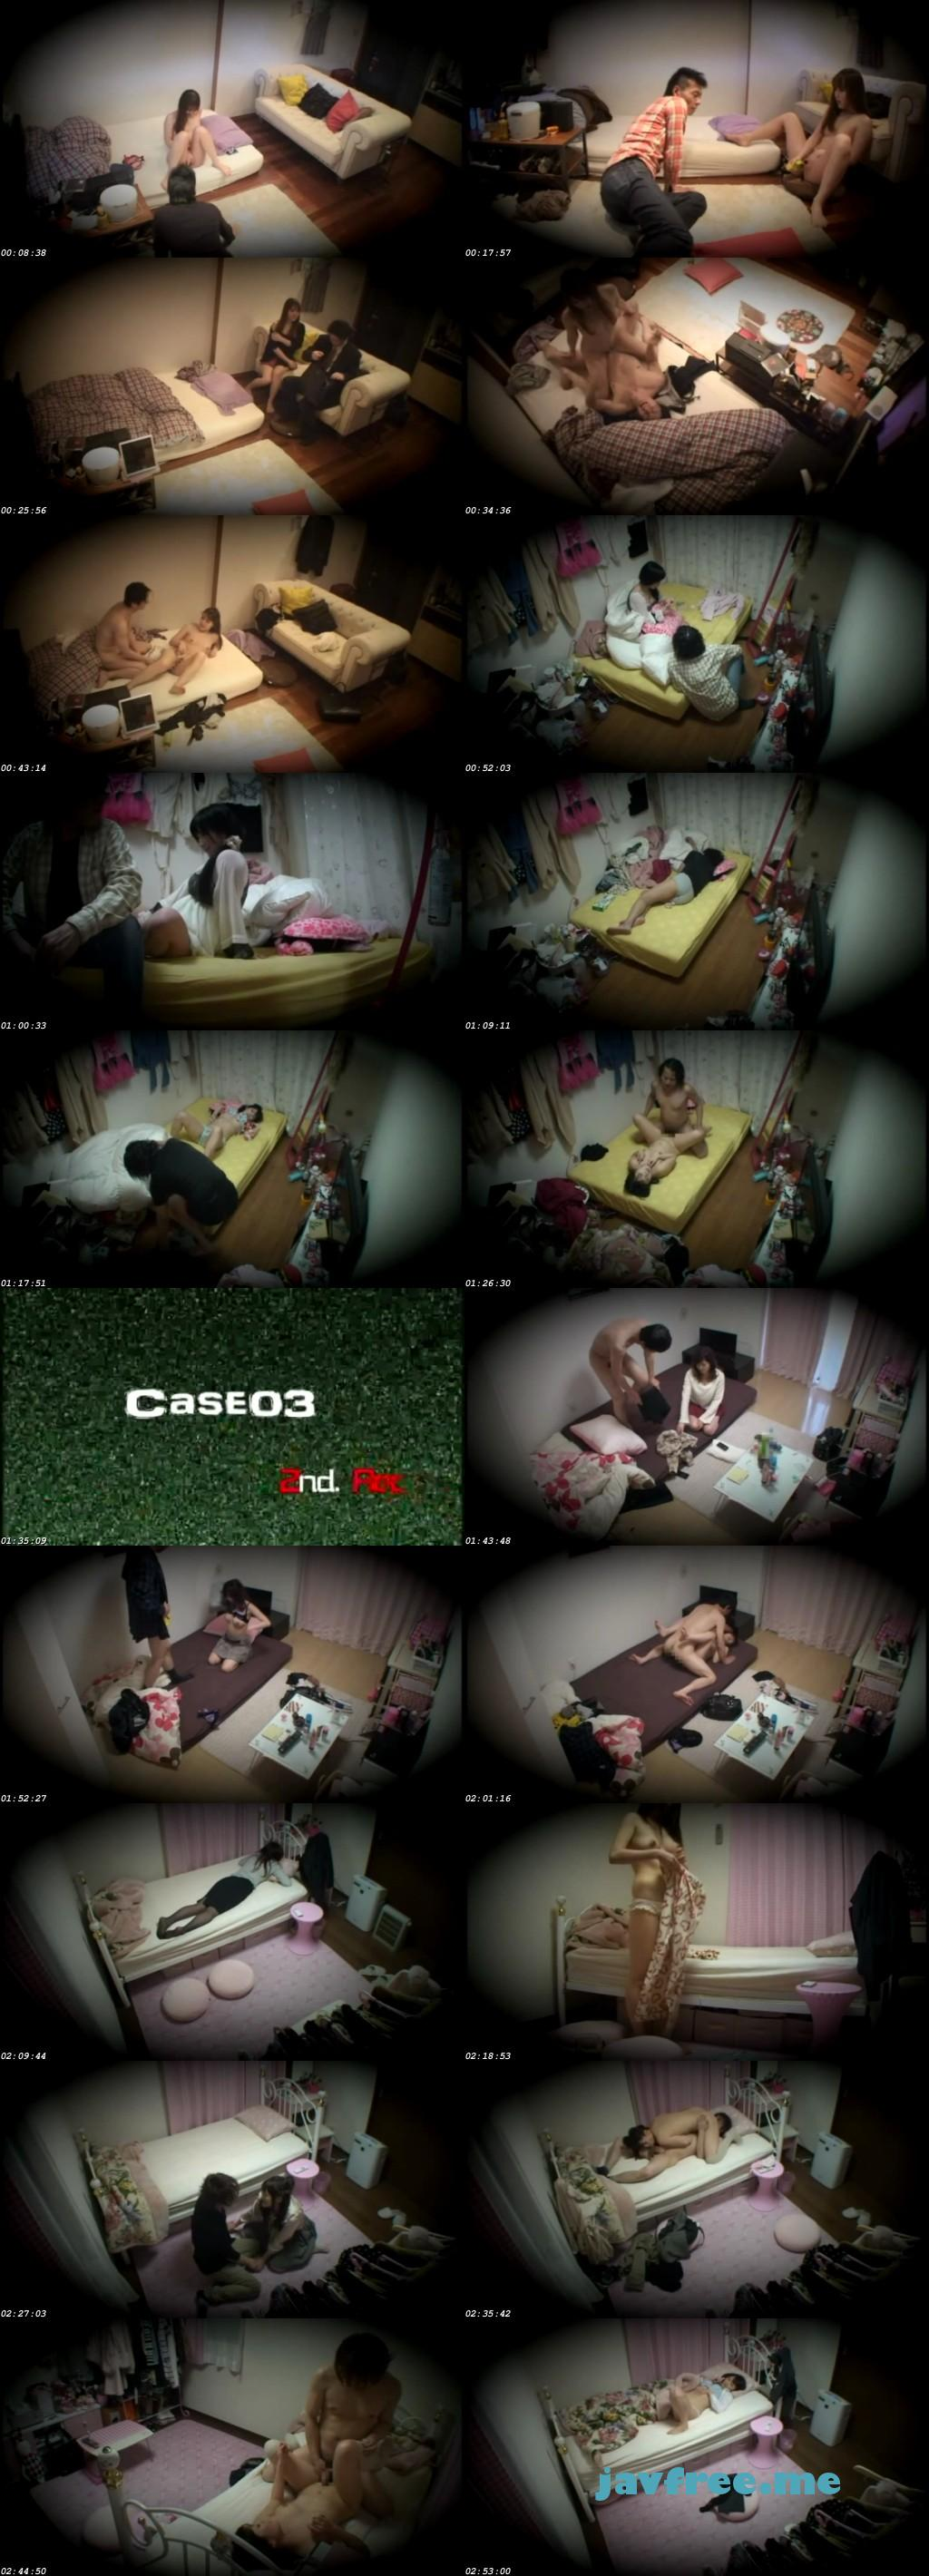 [EQ 078] リアル盗撮 まさかこんなところにまで!密かに仕掛けられた女性宅に隠しカメラ 彼女達の性行為が撮れるまでの数日間の記録映像流出!! 3 EQ